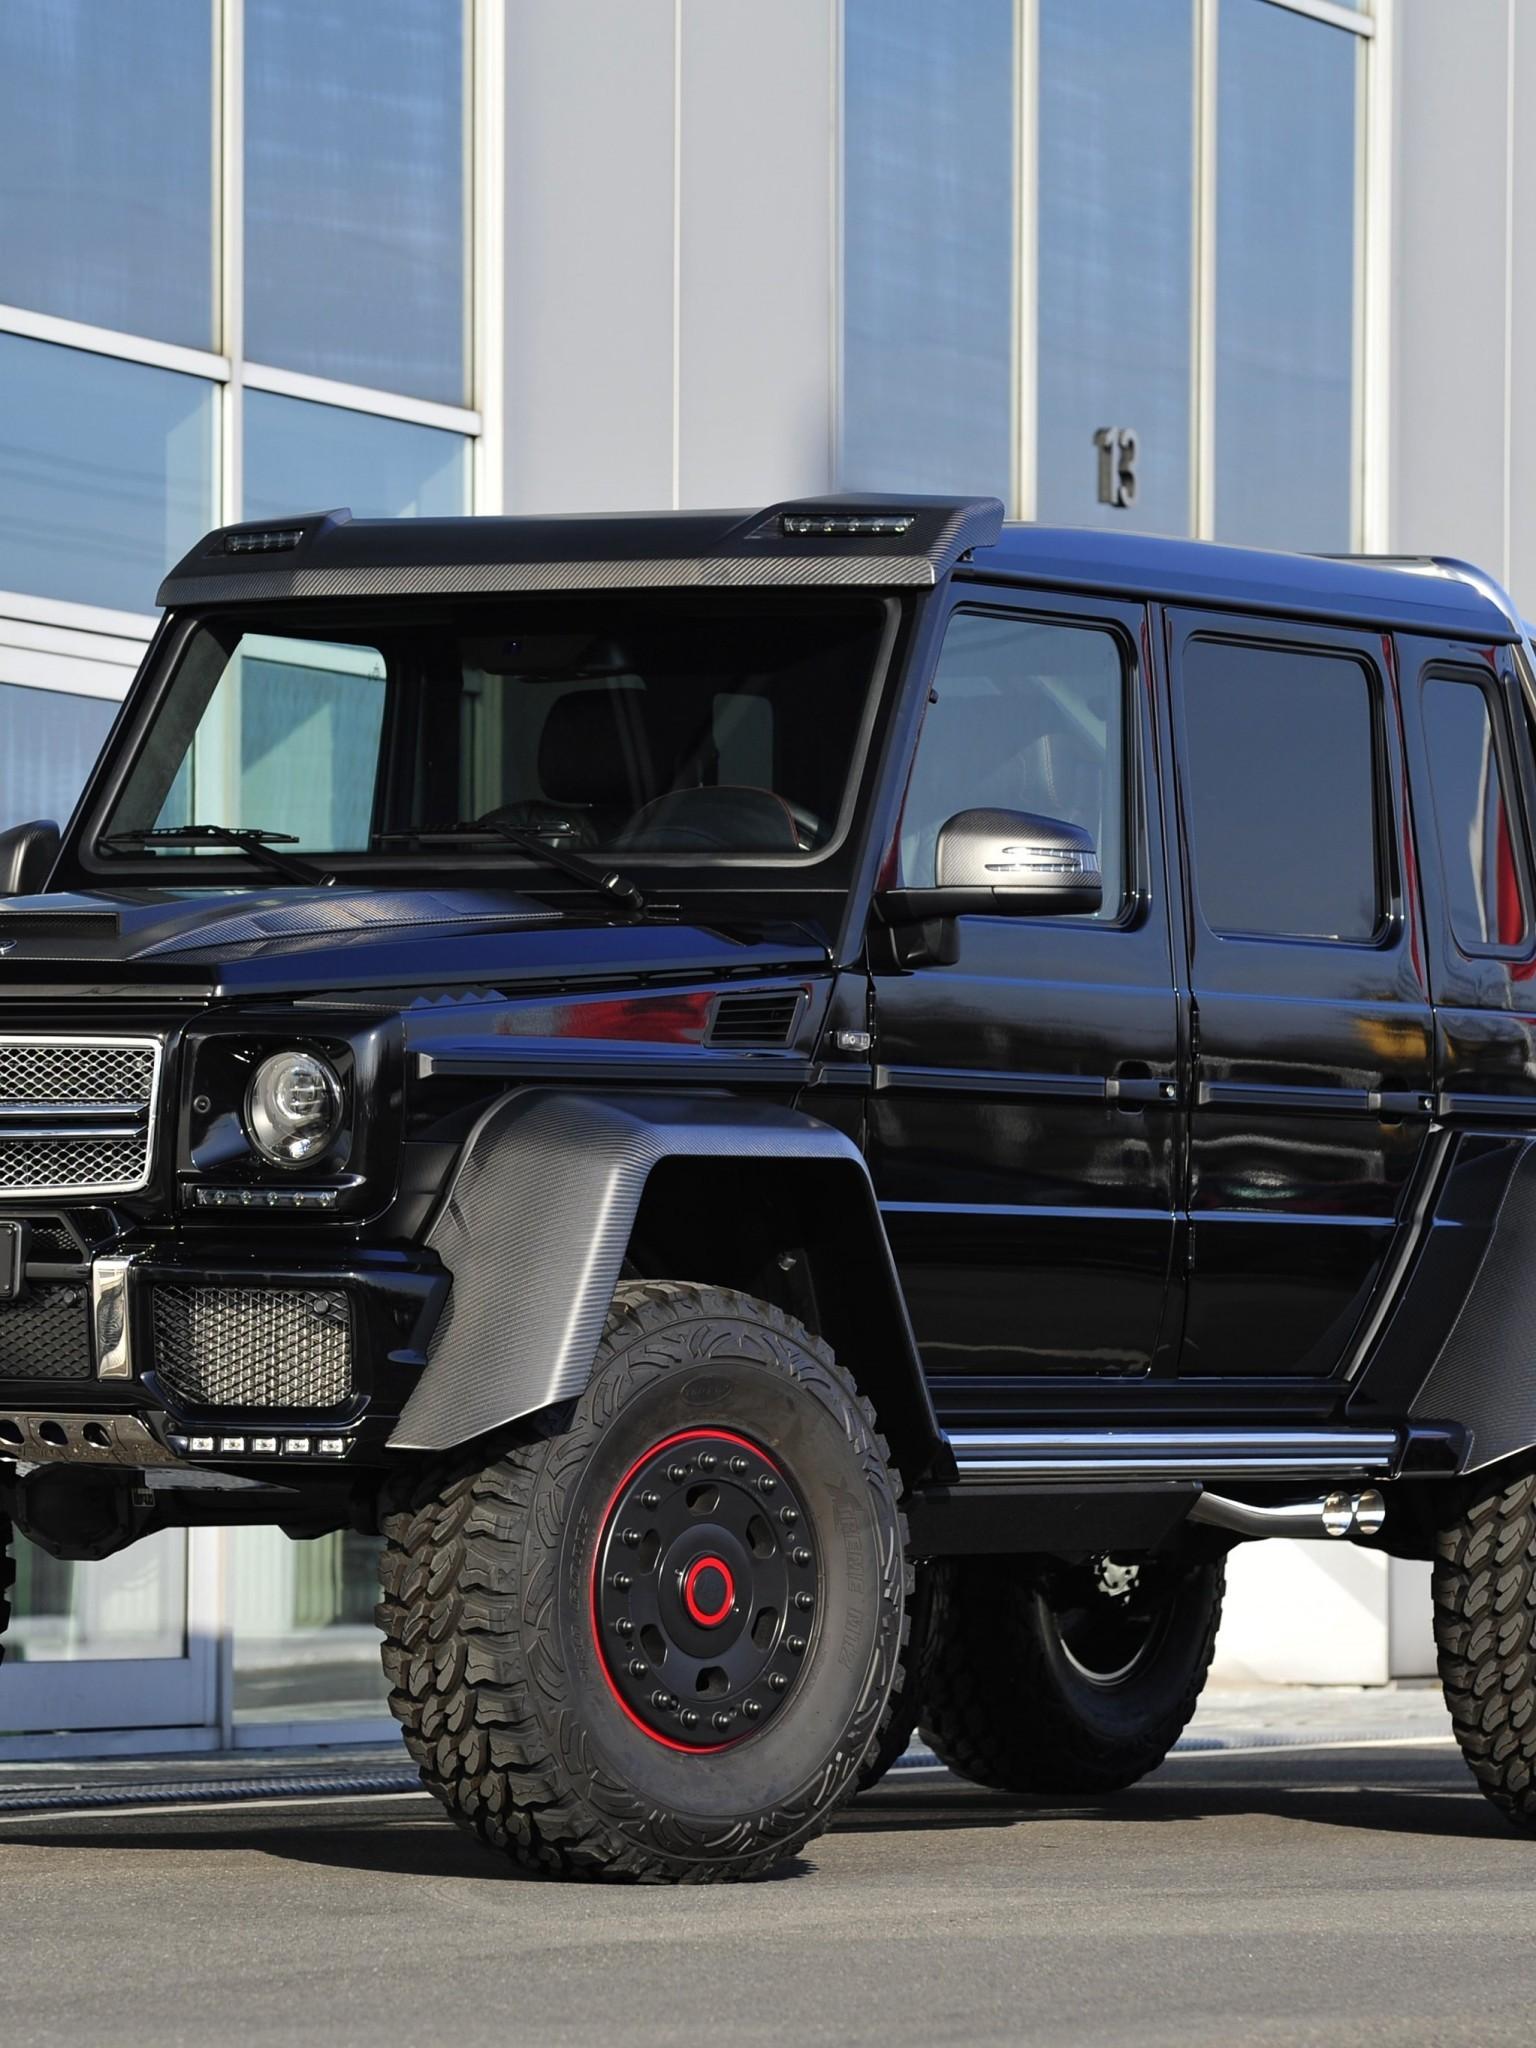 Mercedes Benz G63 Amg 6x6 Black Side View Pickup 1536x2048 Wallpaper Teahub Io